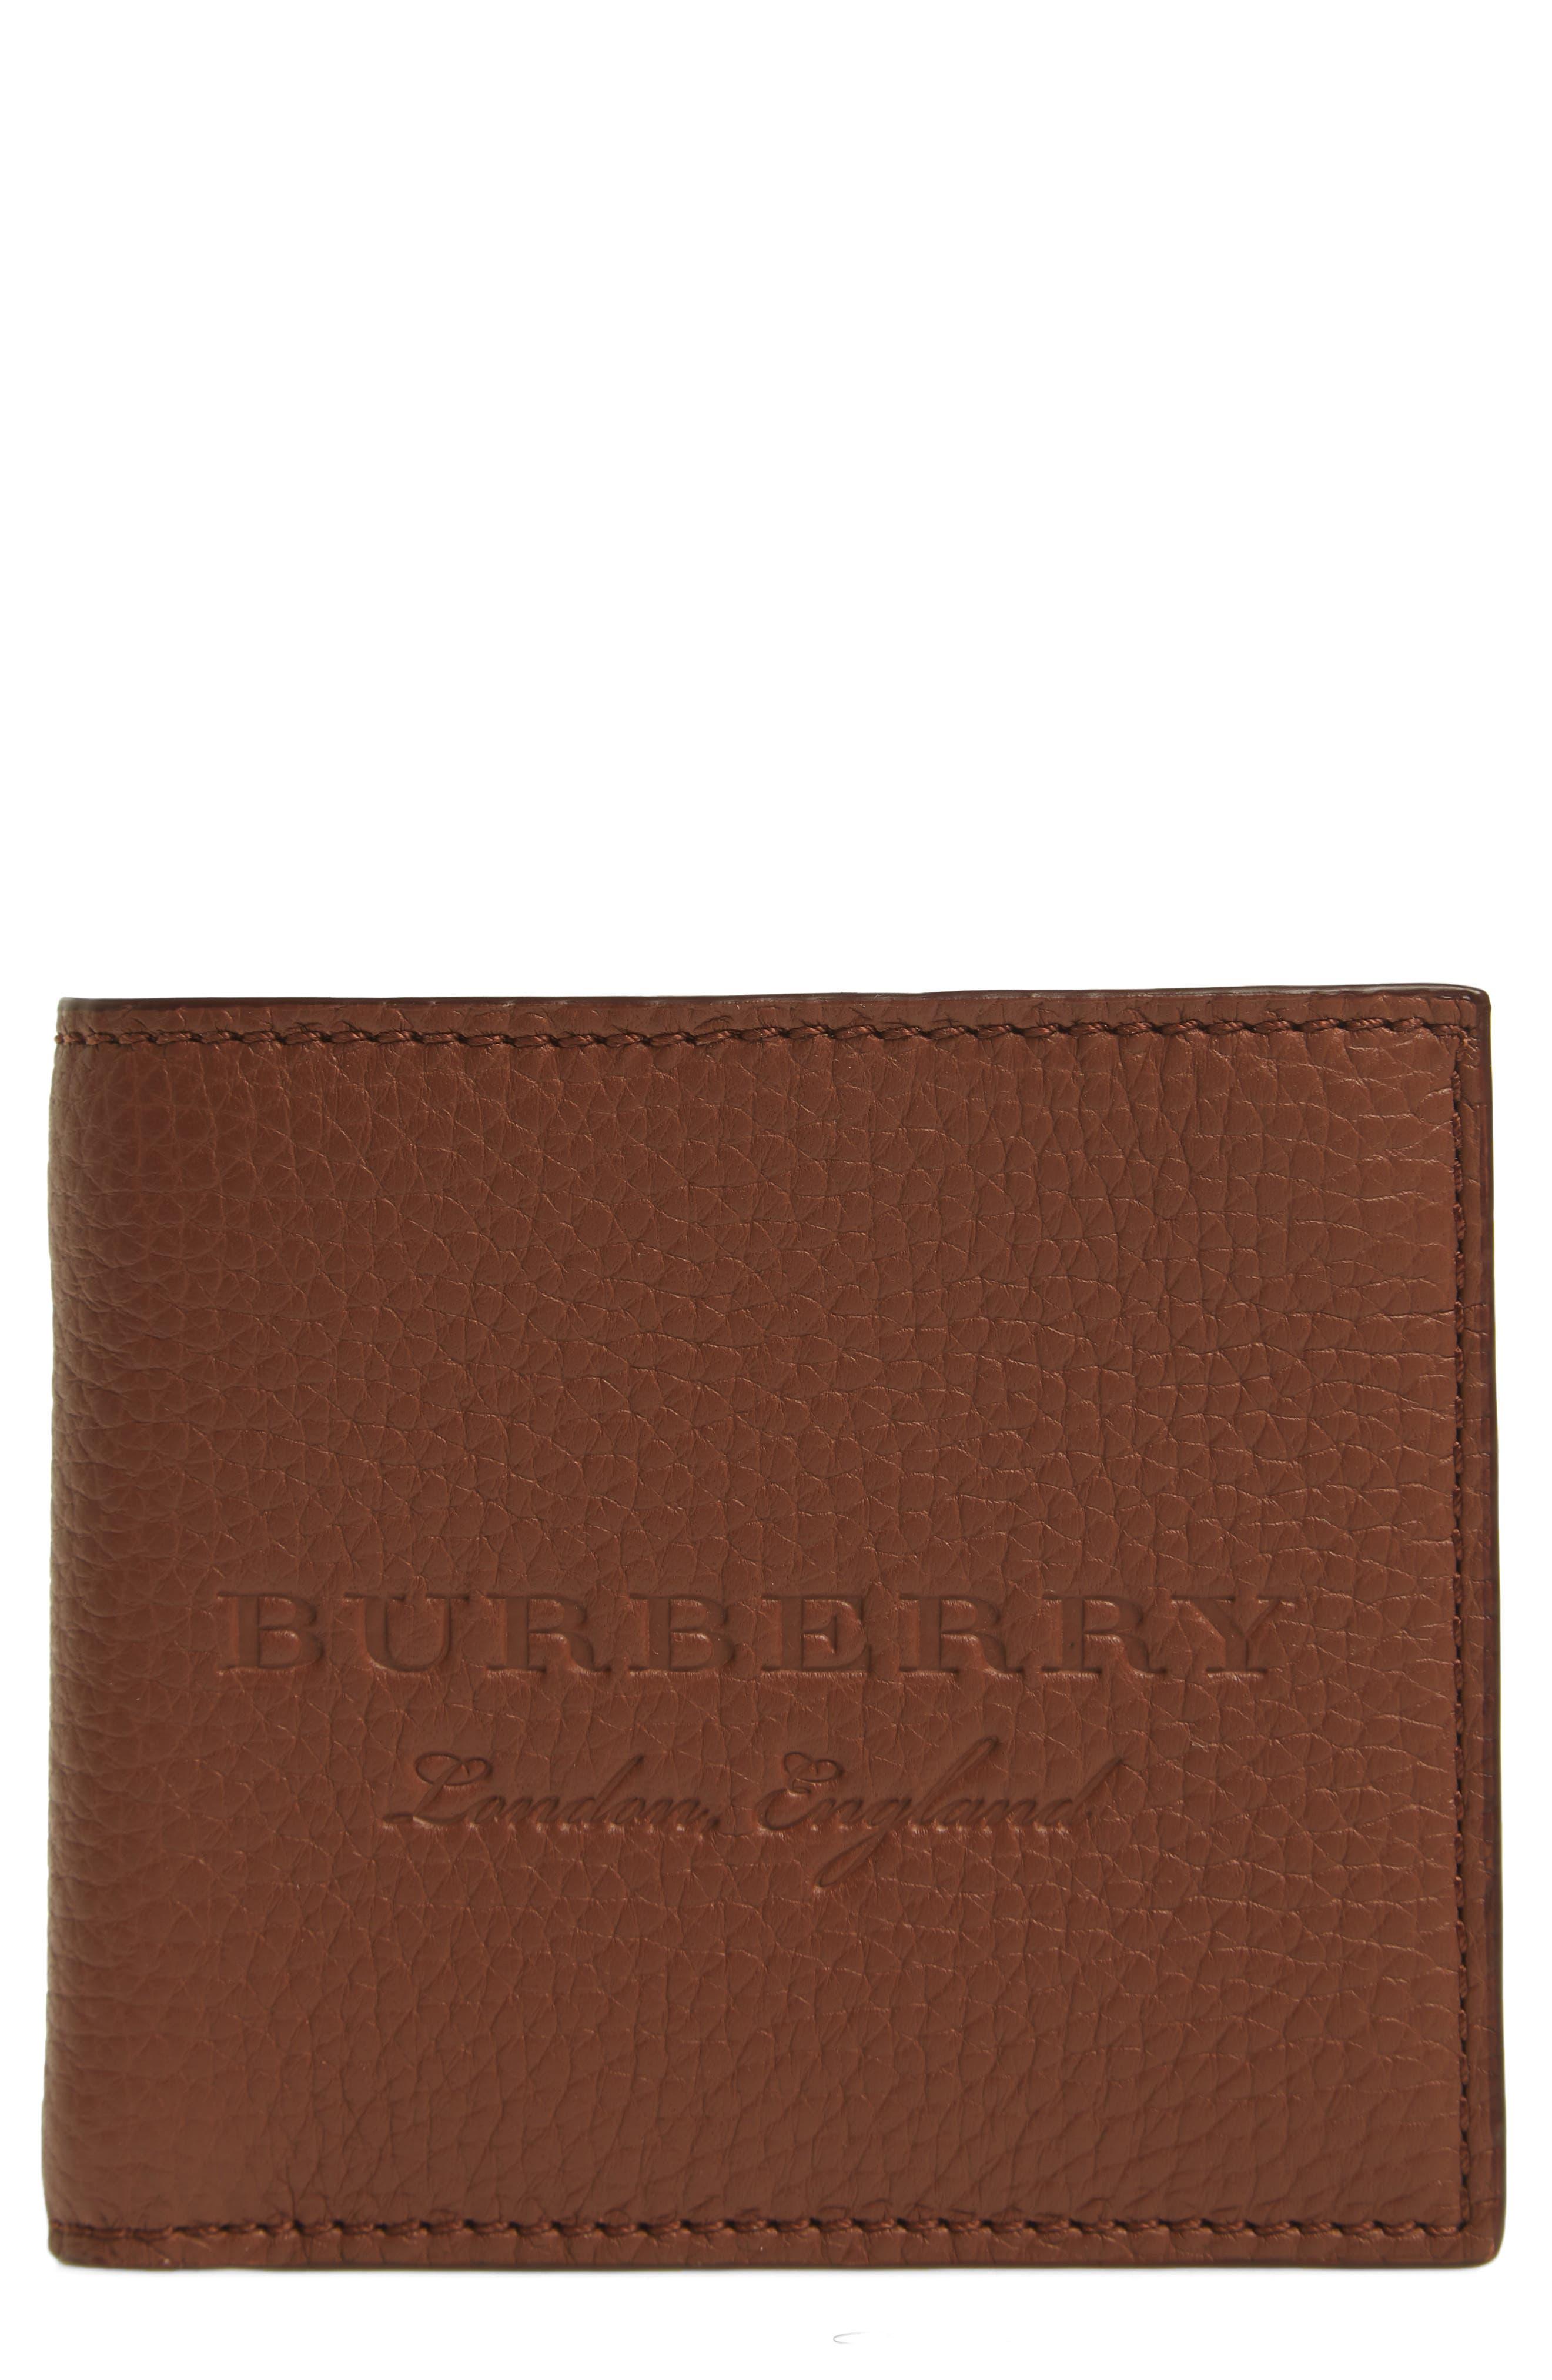 Main Image - Burberry Billfold Wallet